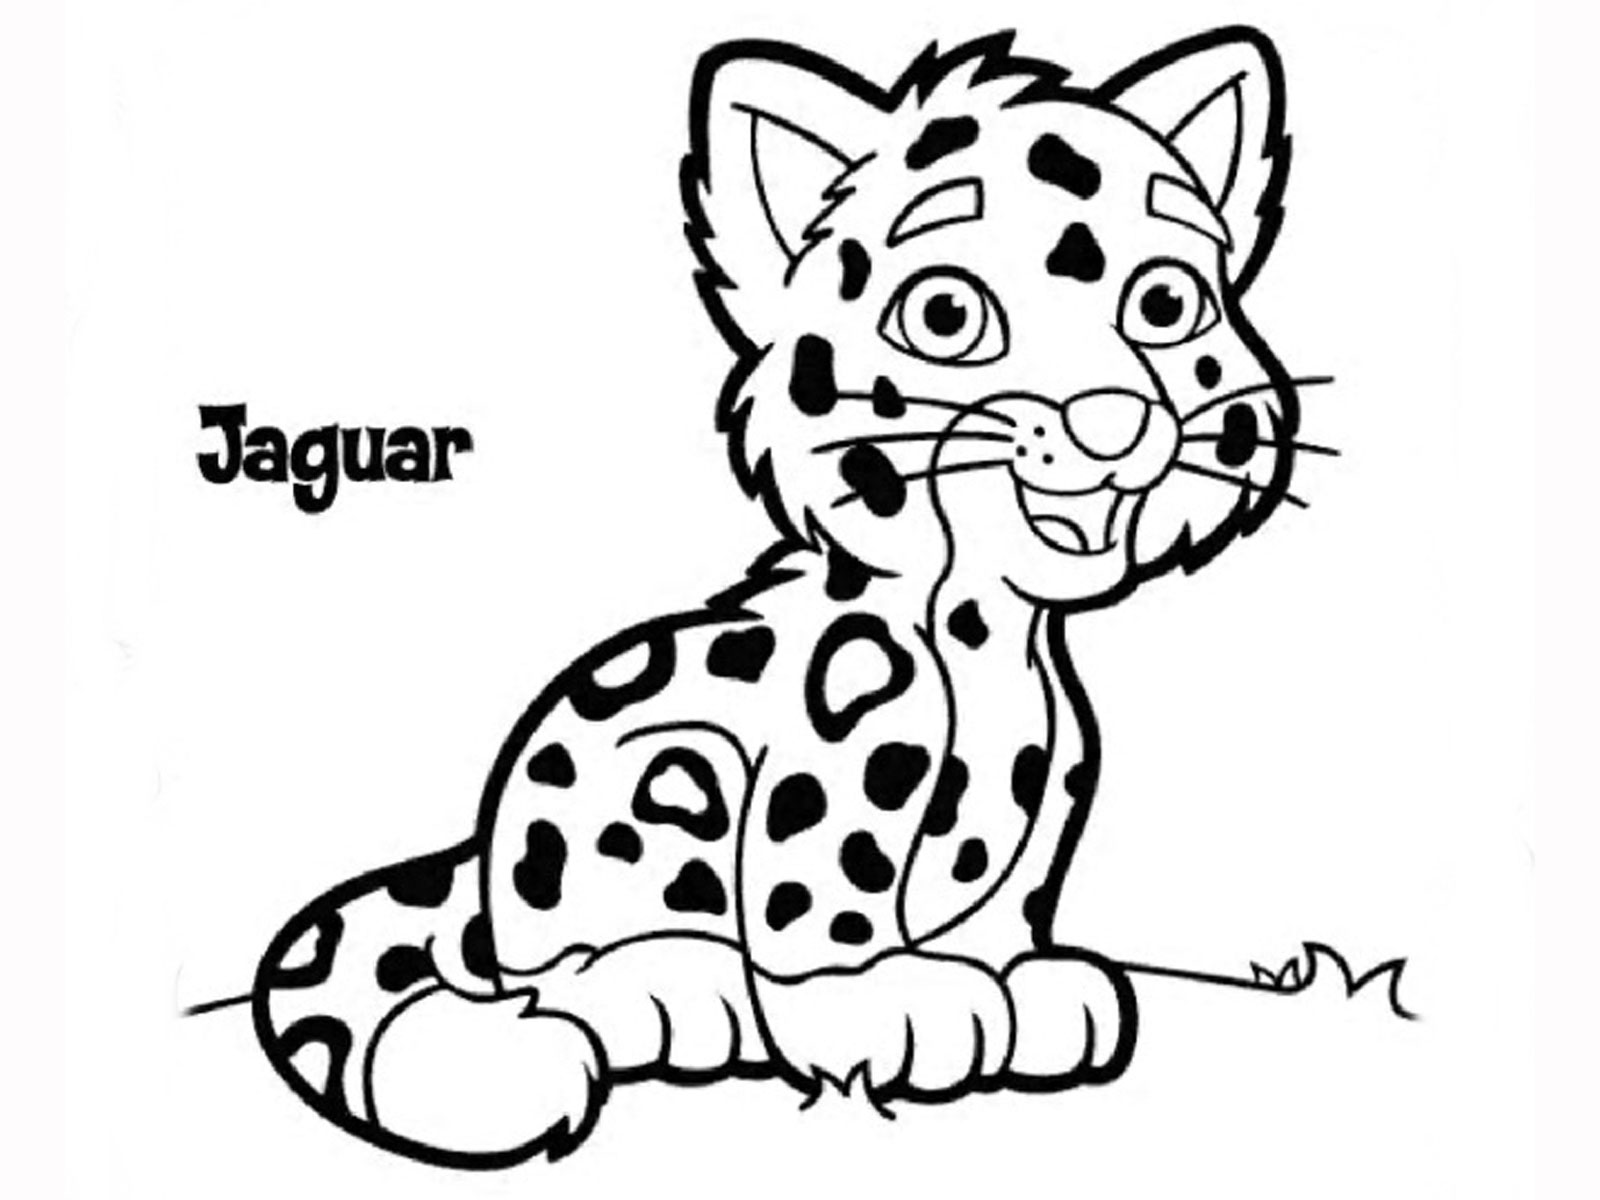 Black and white jaguar clipart banner library stock Jaguar Clipart Black And White | Free download best Jaguar Clipart ... banner library stock